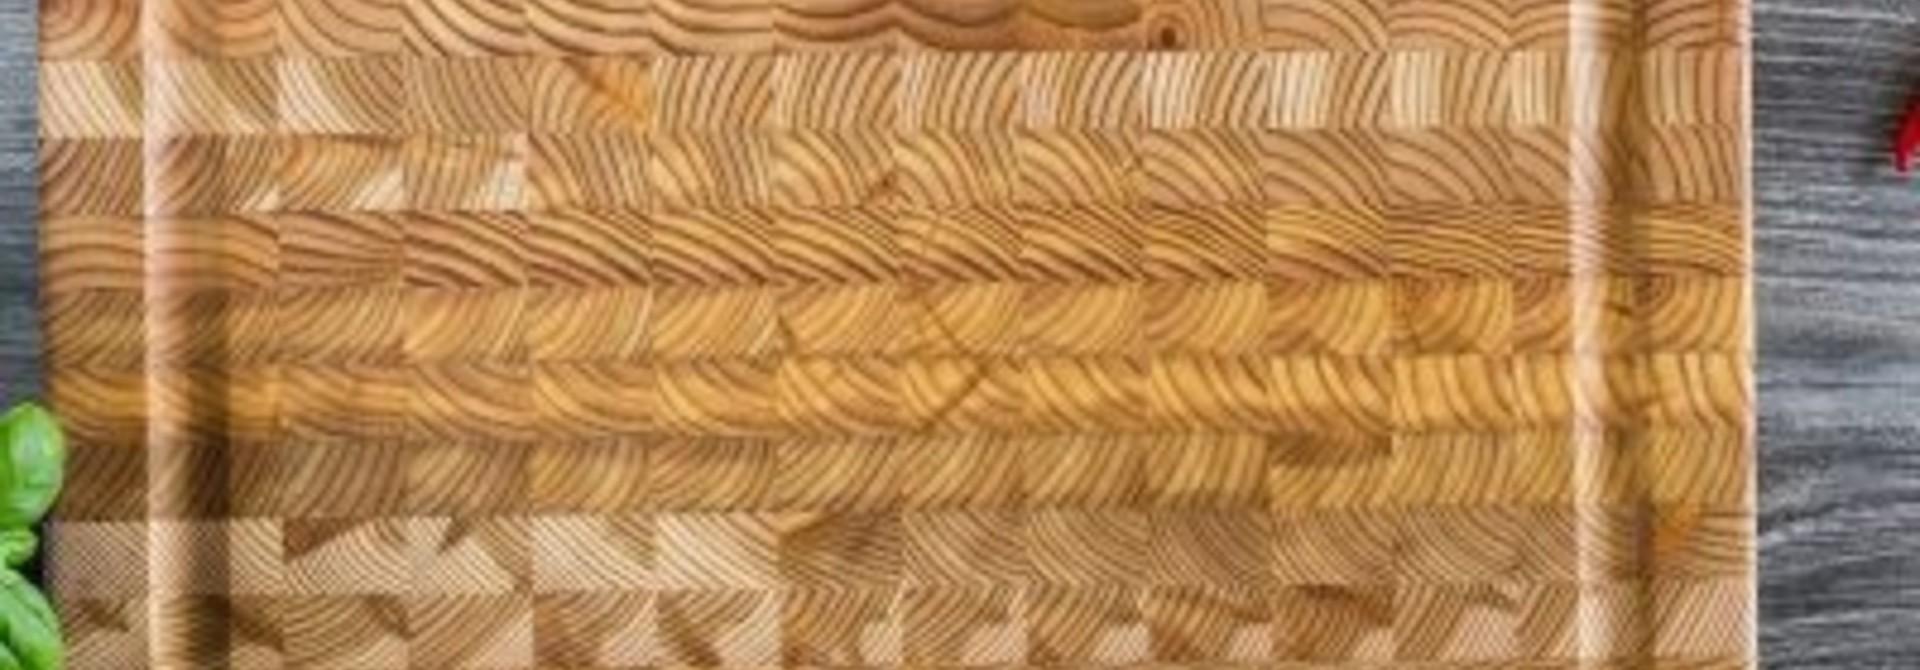 Carvers' Board - Medium